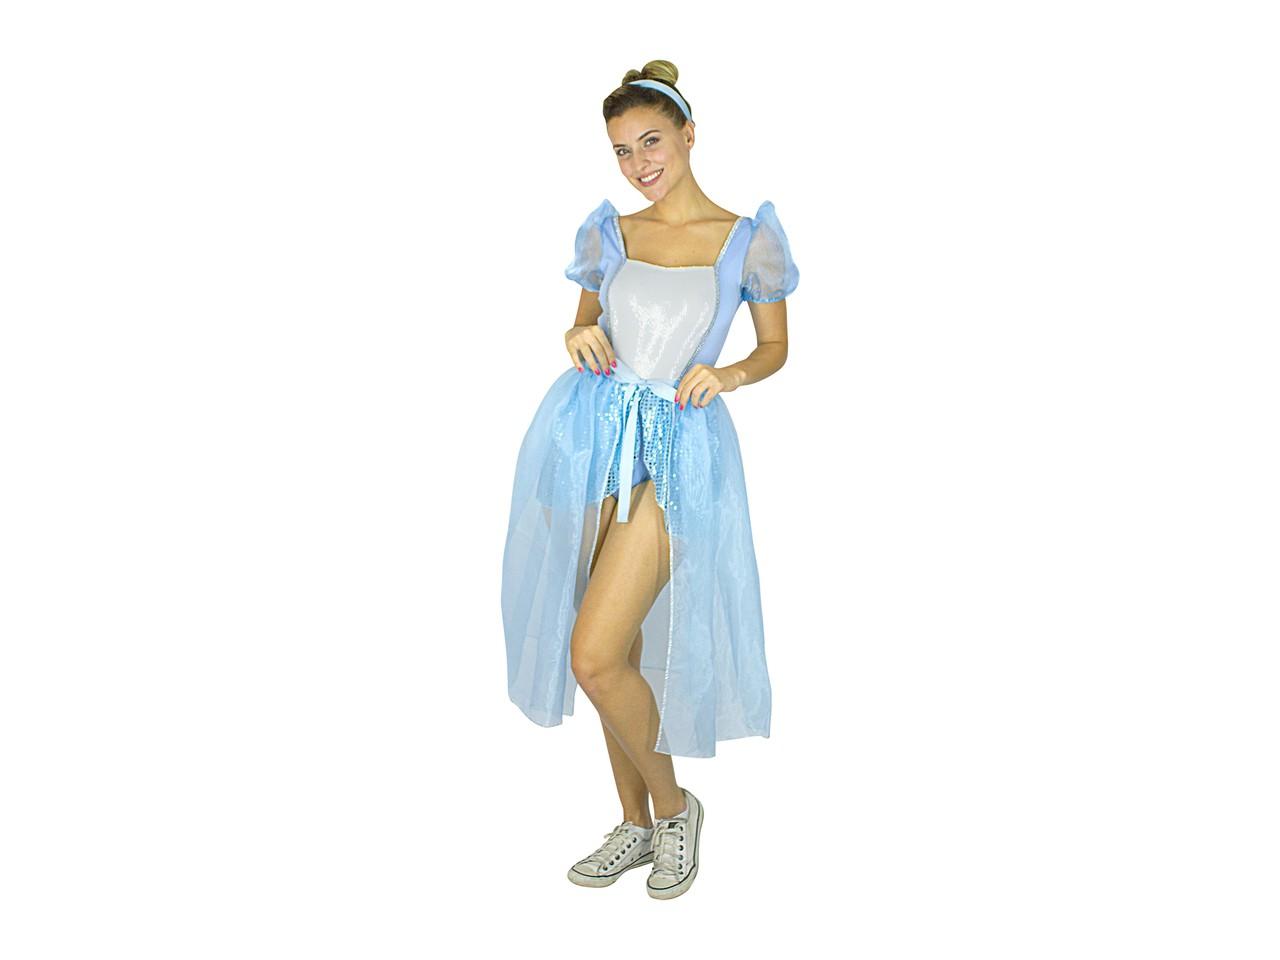 Fantasia Princesas Disney Ariel Branca De Neve Cinderela